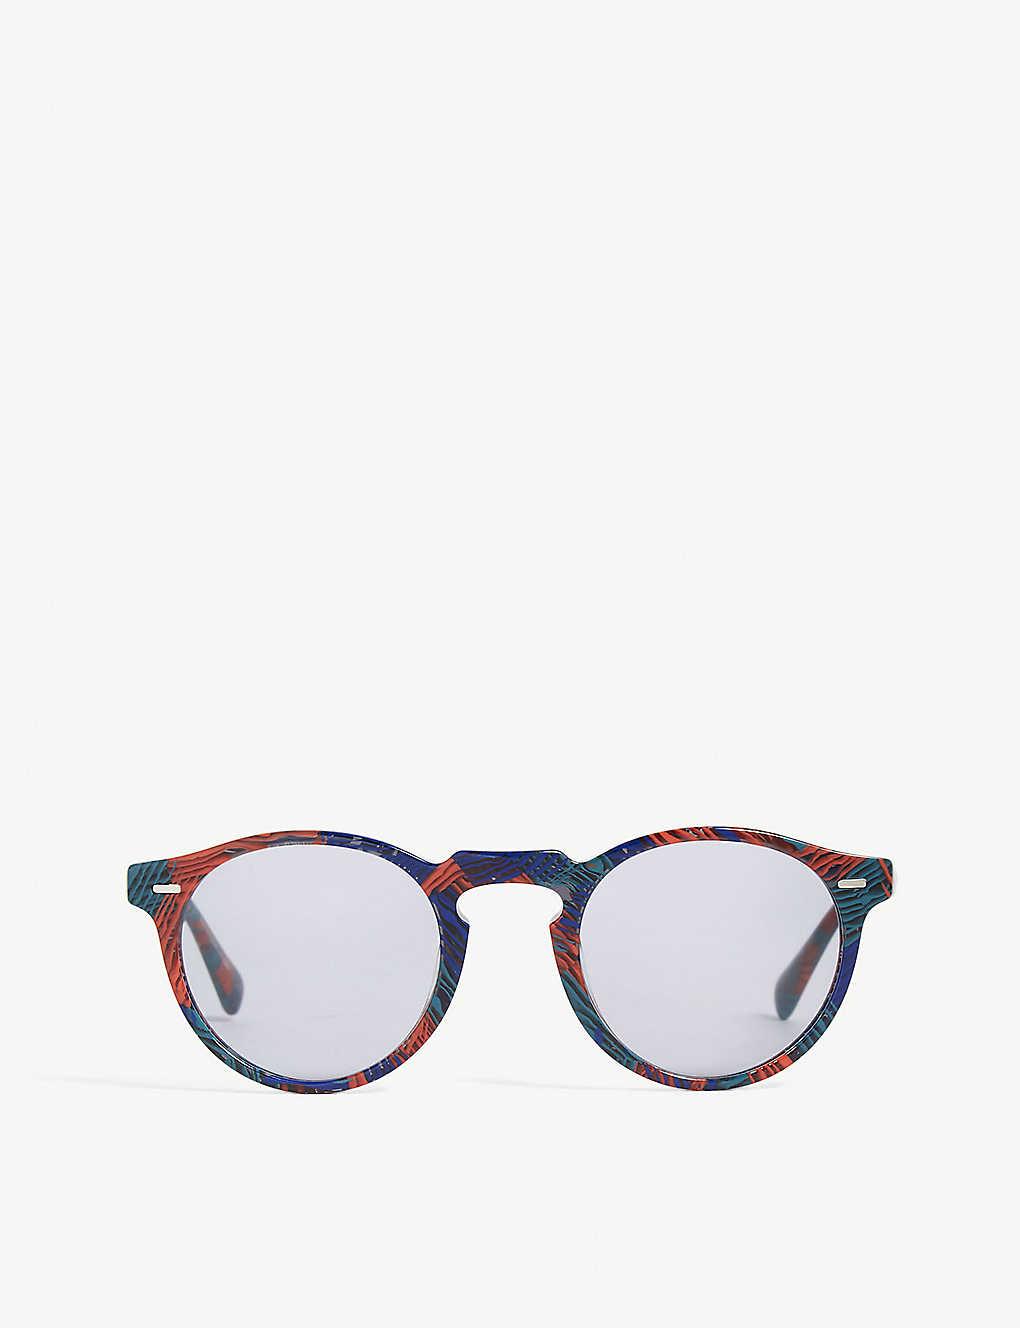 75017475f308 OLIVER PEOPLES - Gregory Peck Phantos-frame sunglasses | Selfridges.com